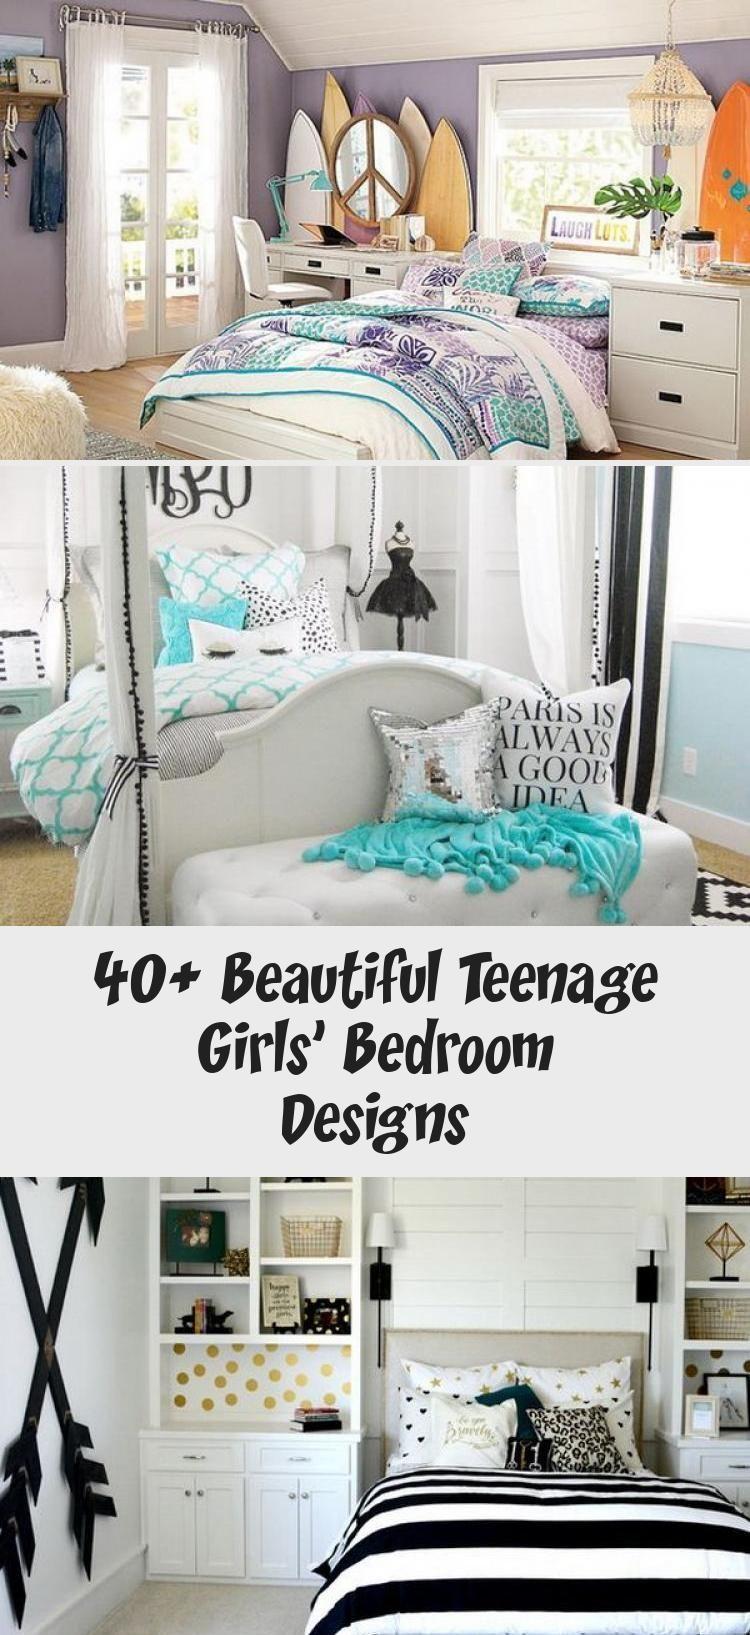 PALE YELLOW TRIANGLES GIRLS BEDROOM WALL DECALS Teen Girl Nursery Dorm Baby Room